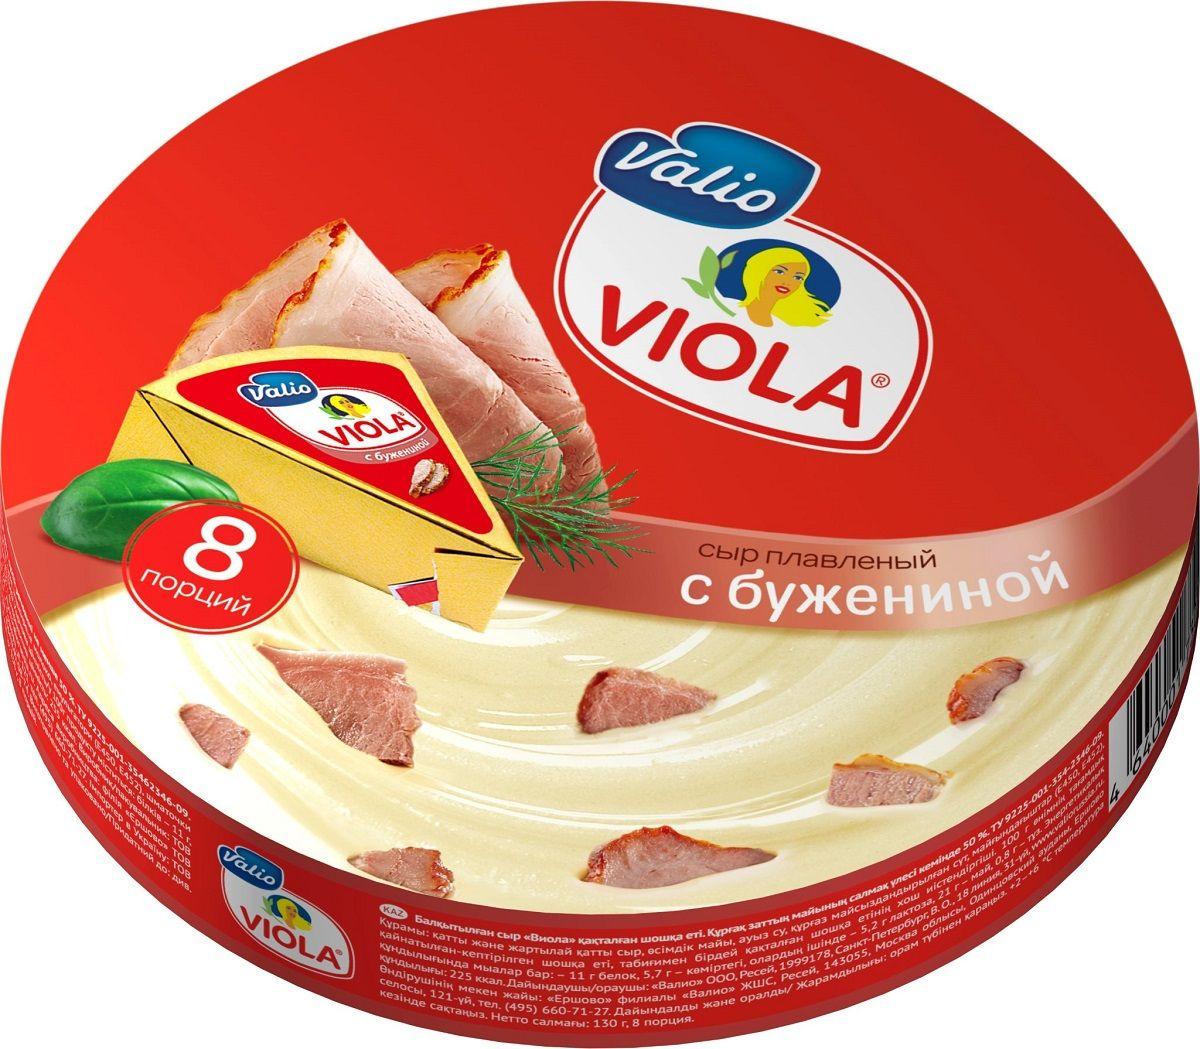 Valio Viola Сыр с бужениной, плавленый, 130 г valio viola сыр с бужениной плавленый 130 г